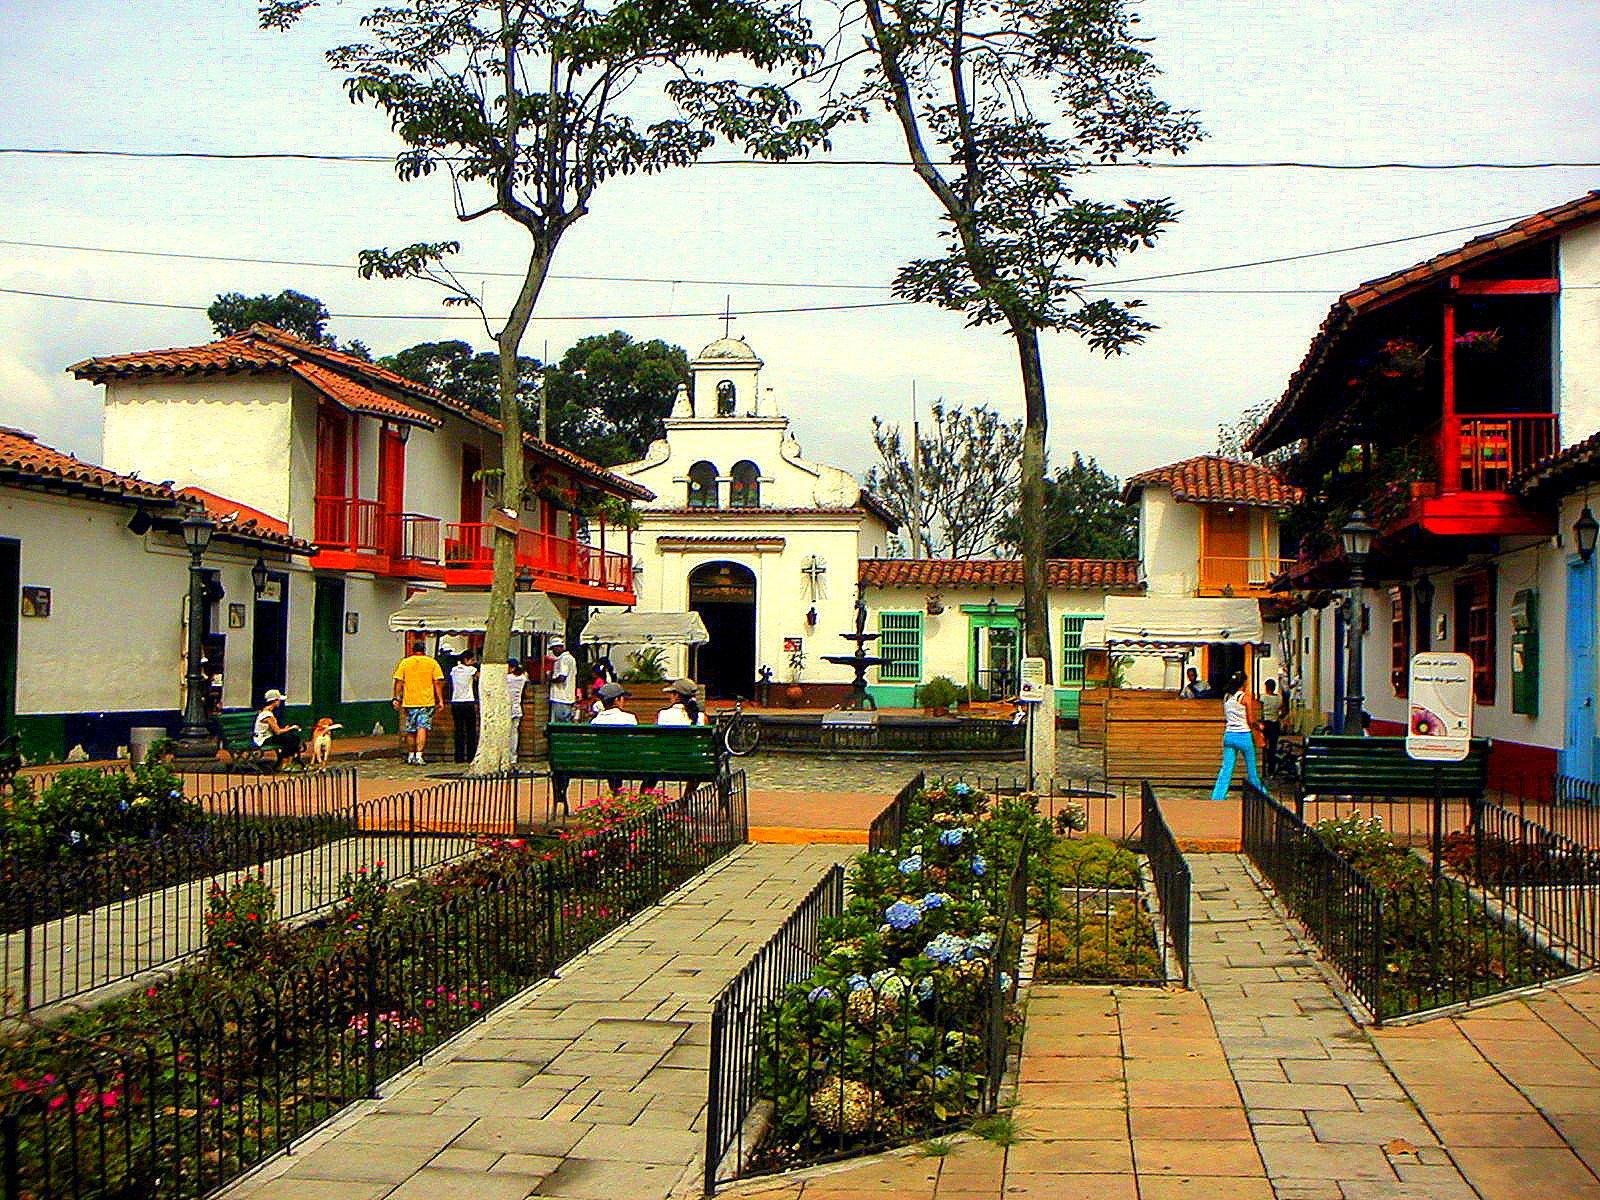 Pueblito paisa en Medellín, un lugar de arquitectura antioqueña tradicional.